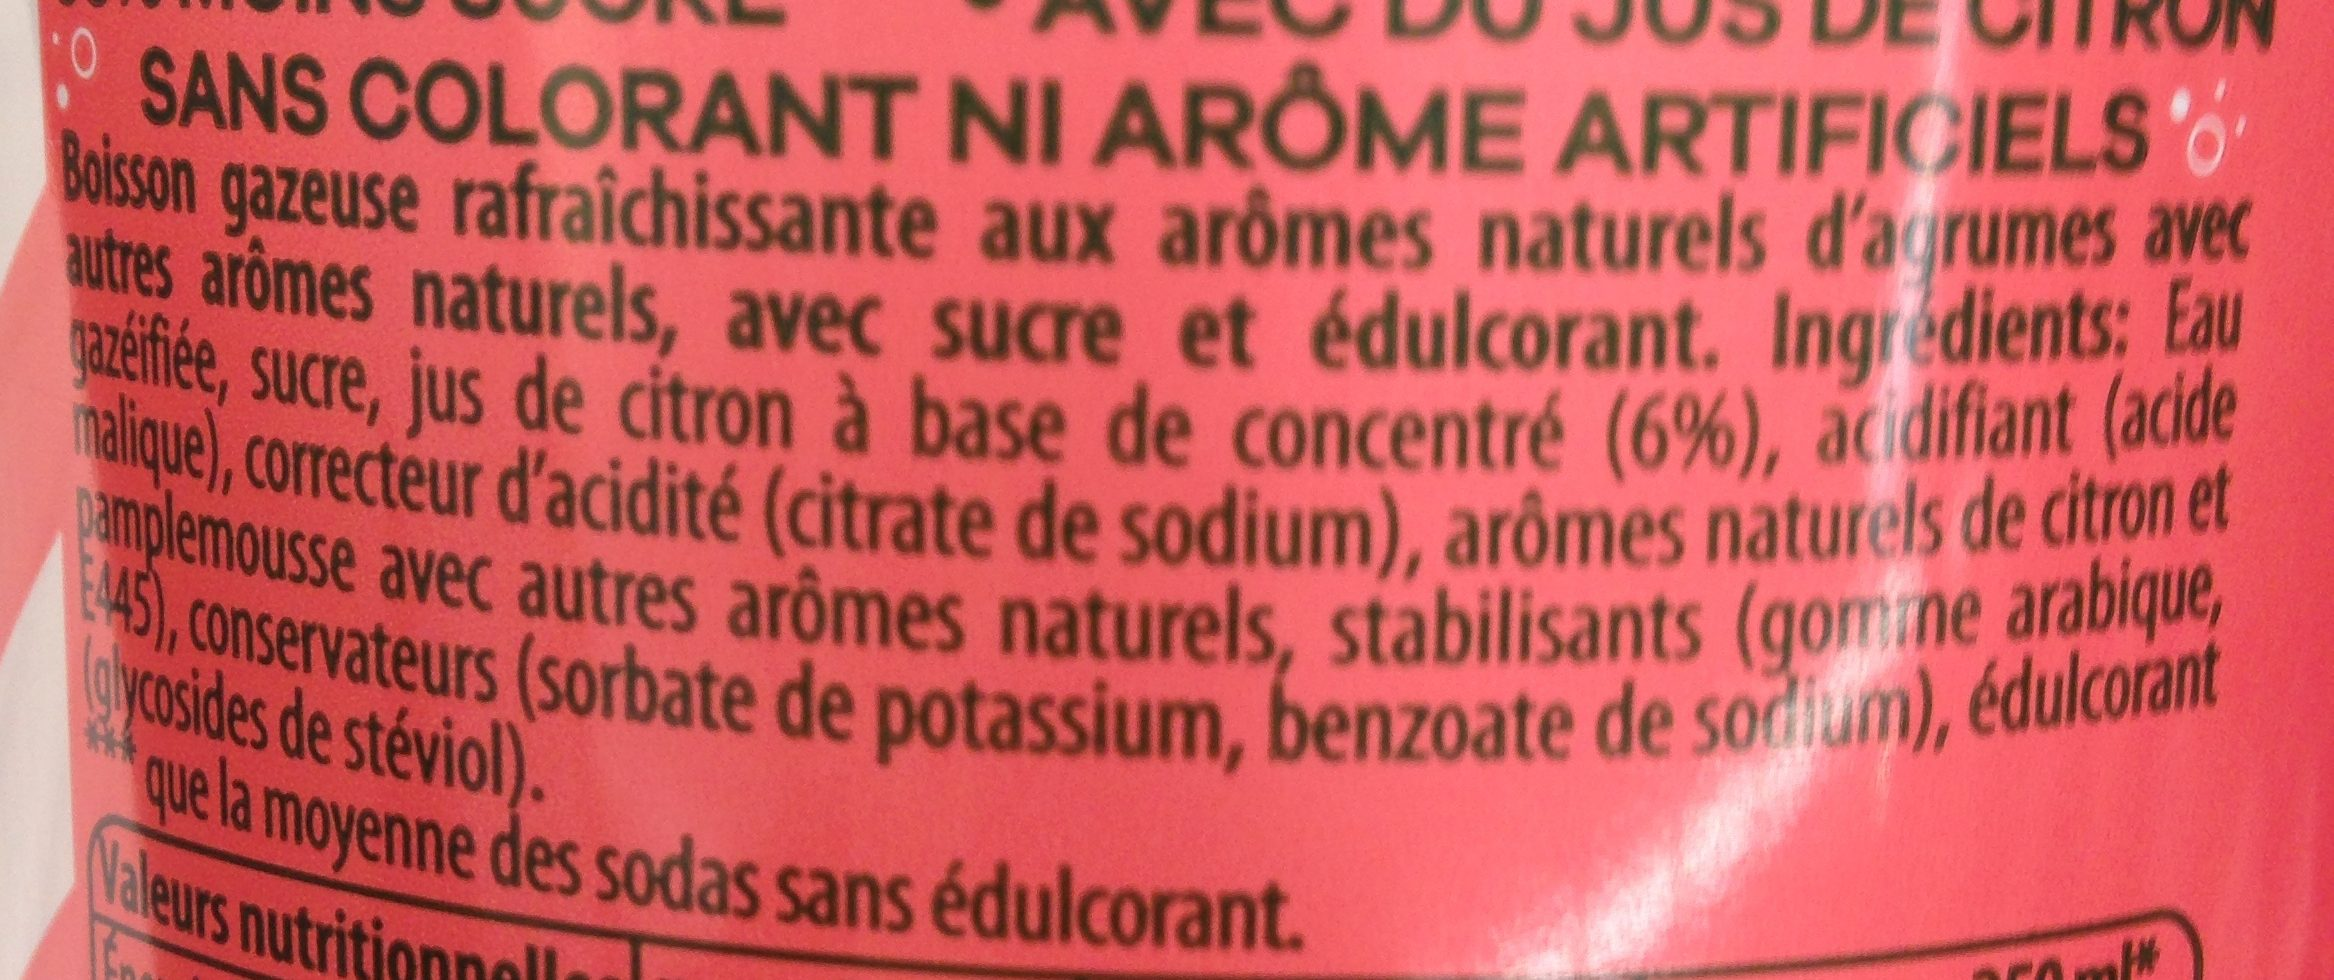 7UP Lemon Lemon Citronnade gazeuse saveur agrumes 1,25 L - Ingredienti - fr